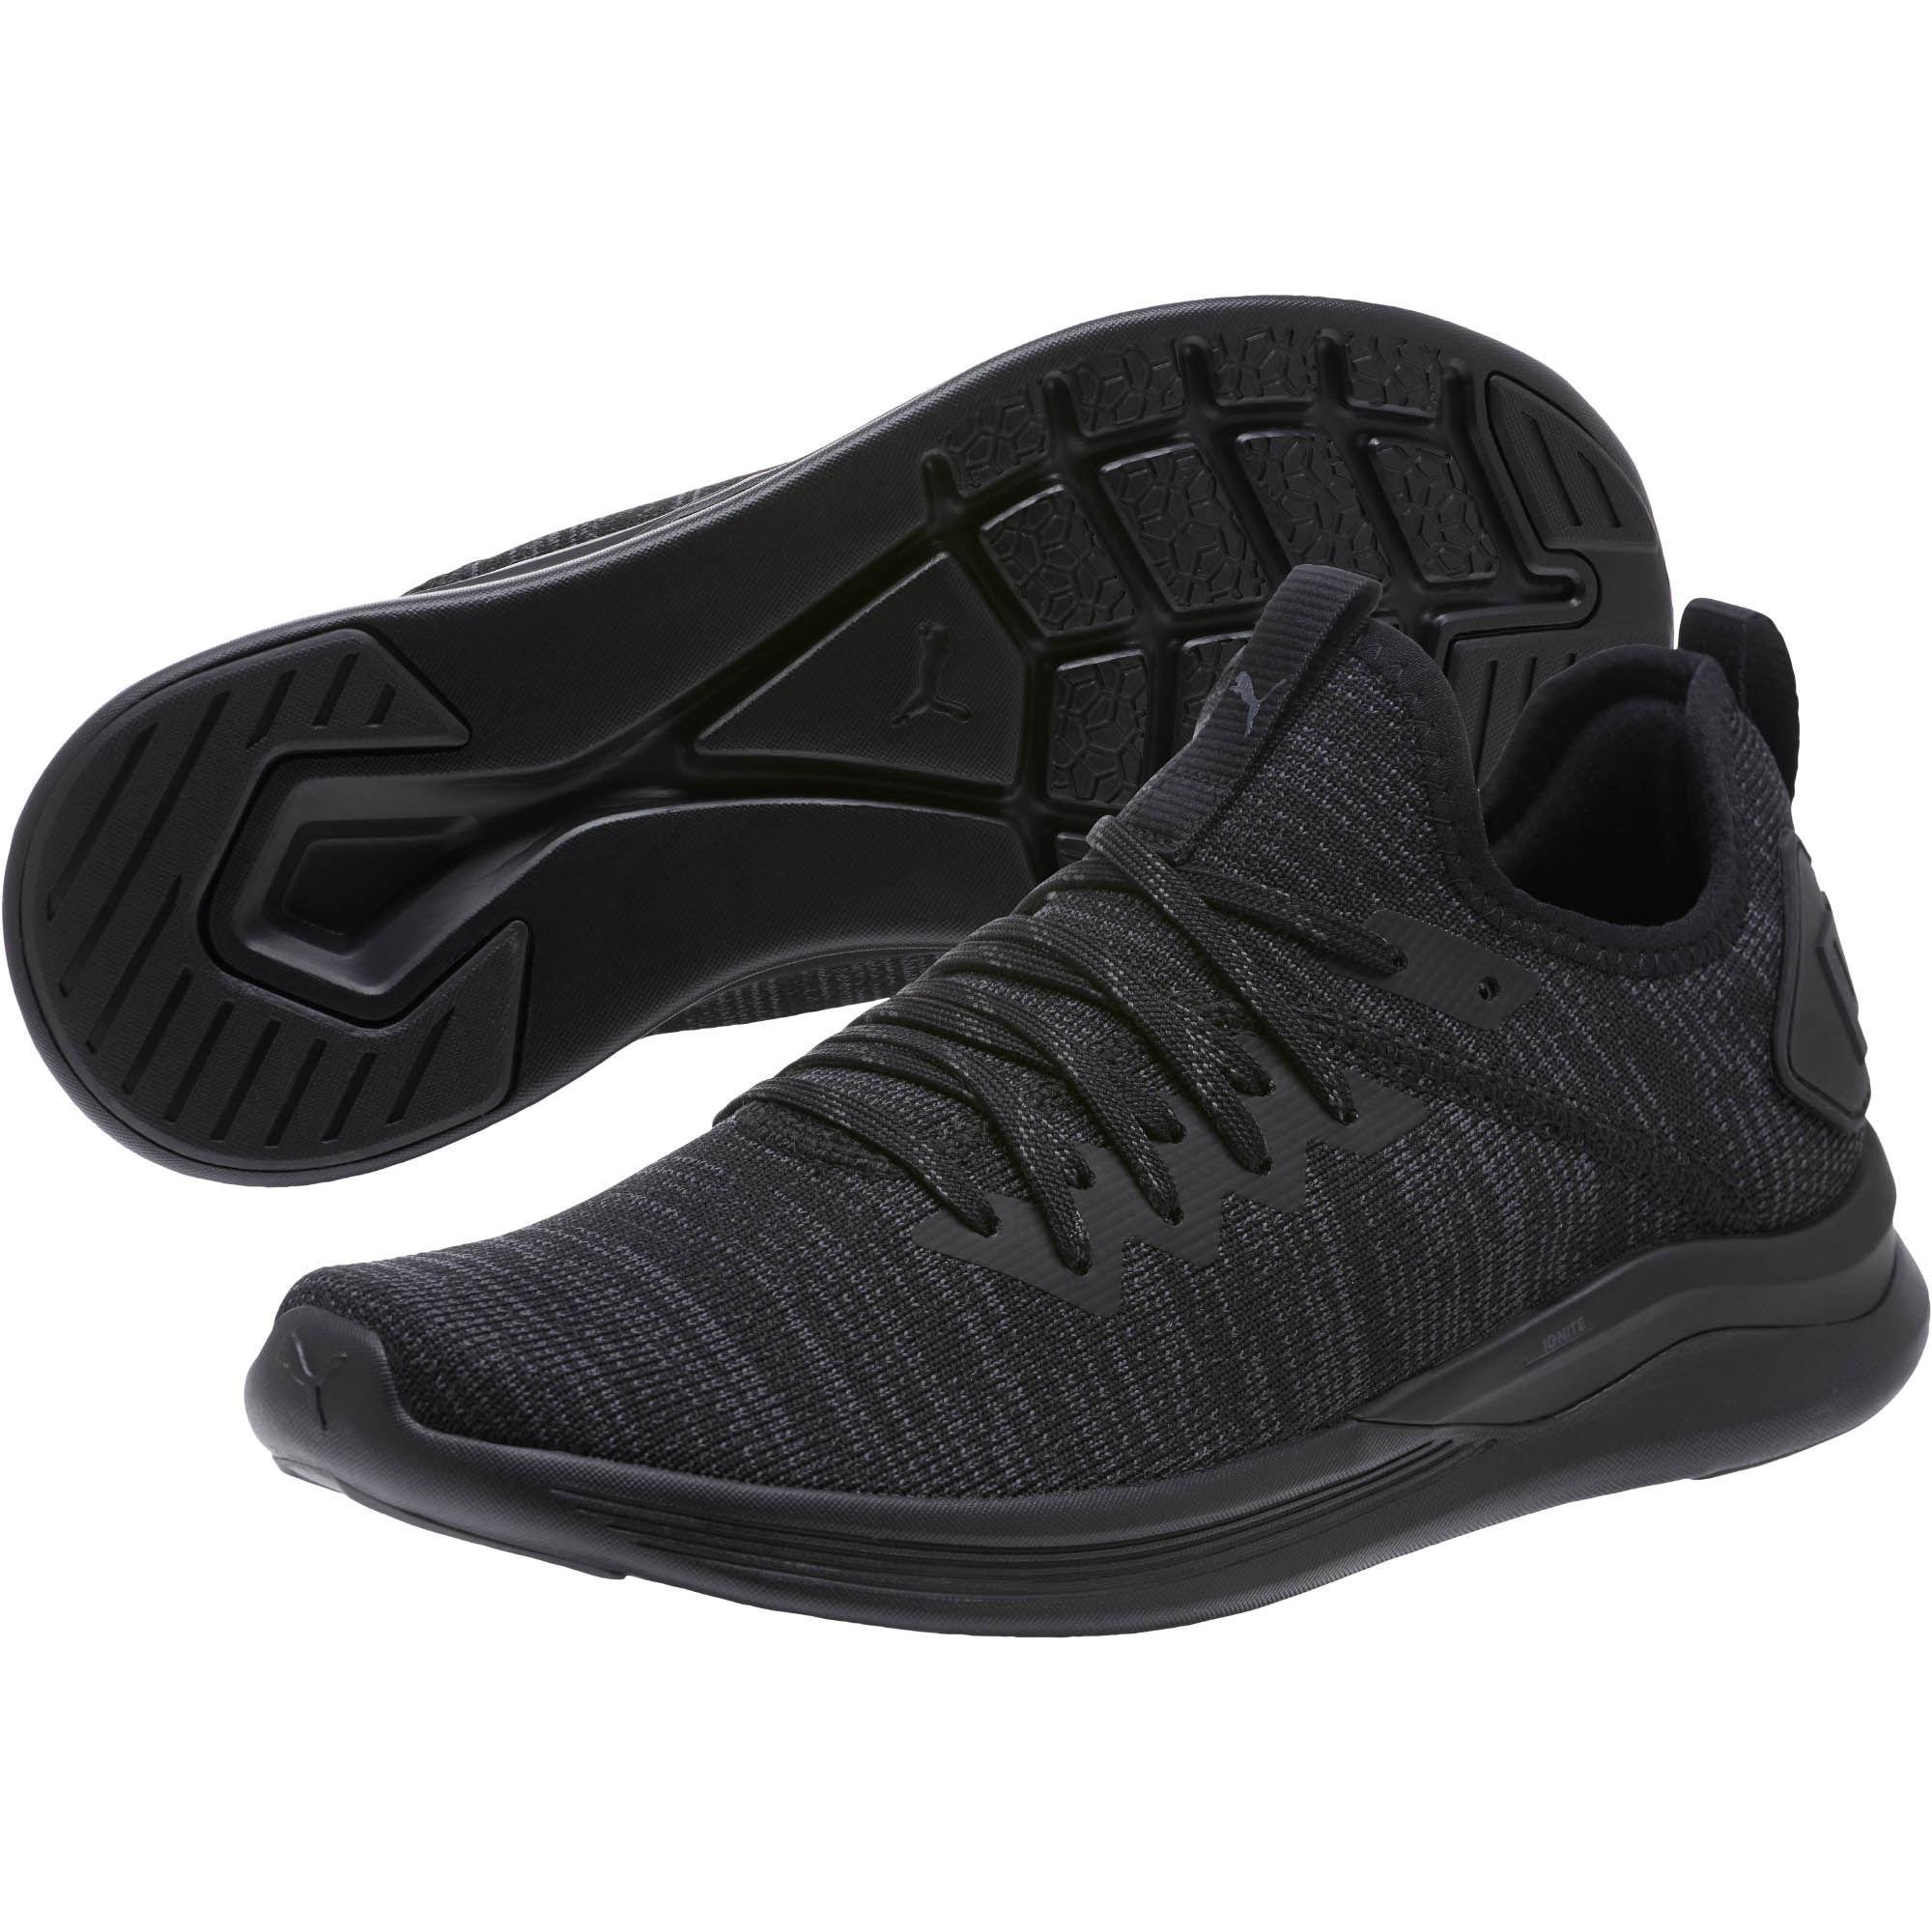 new product 0b3ce f1fcd Black Ignite Flash Evoknit Women's Training Shoes